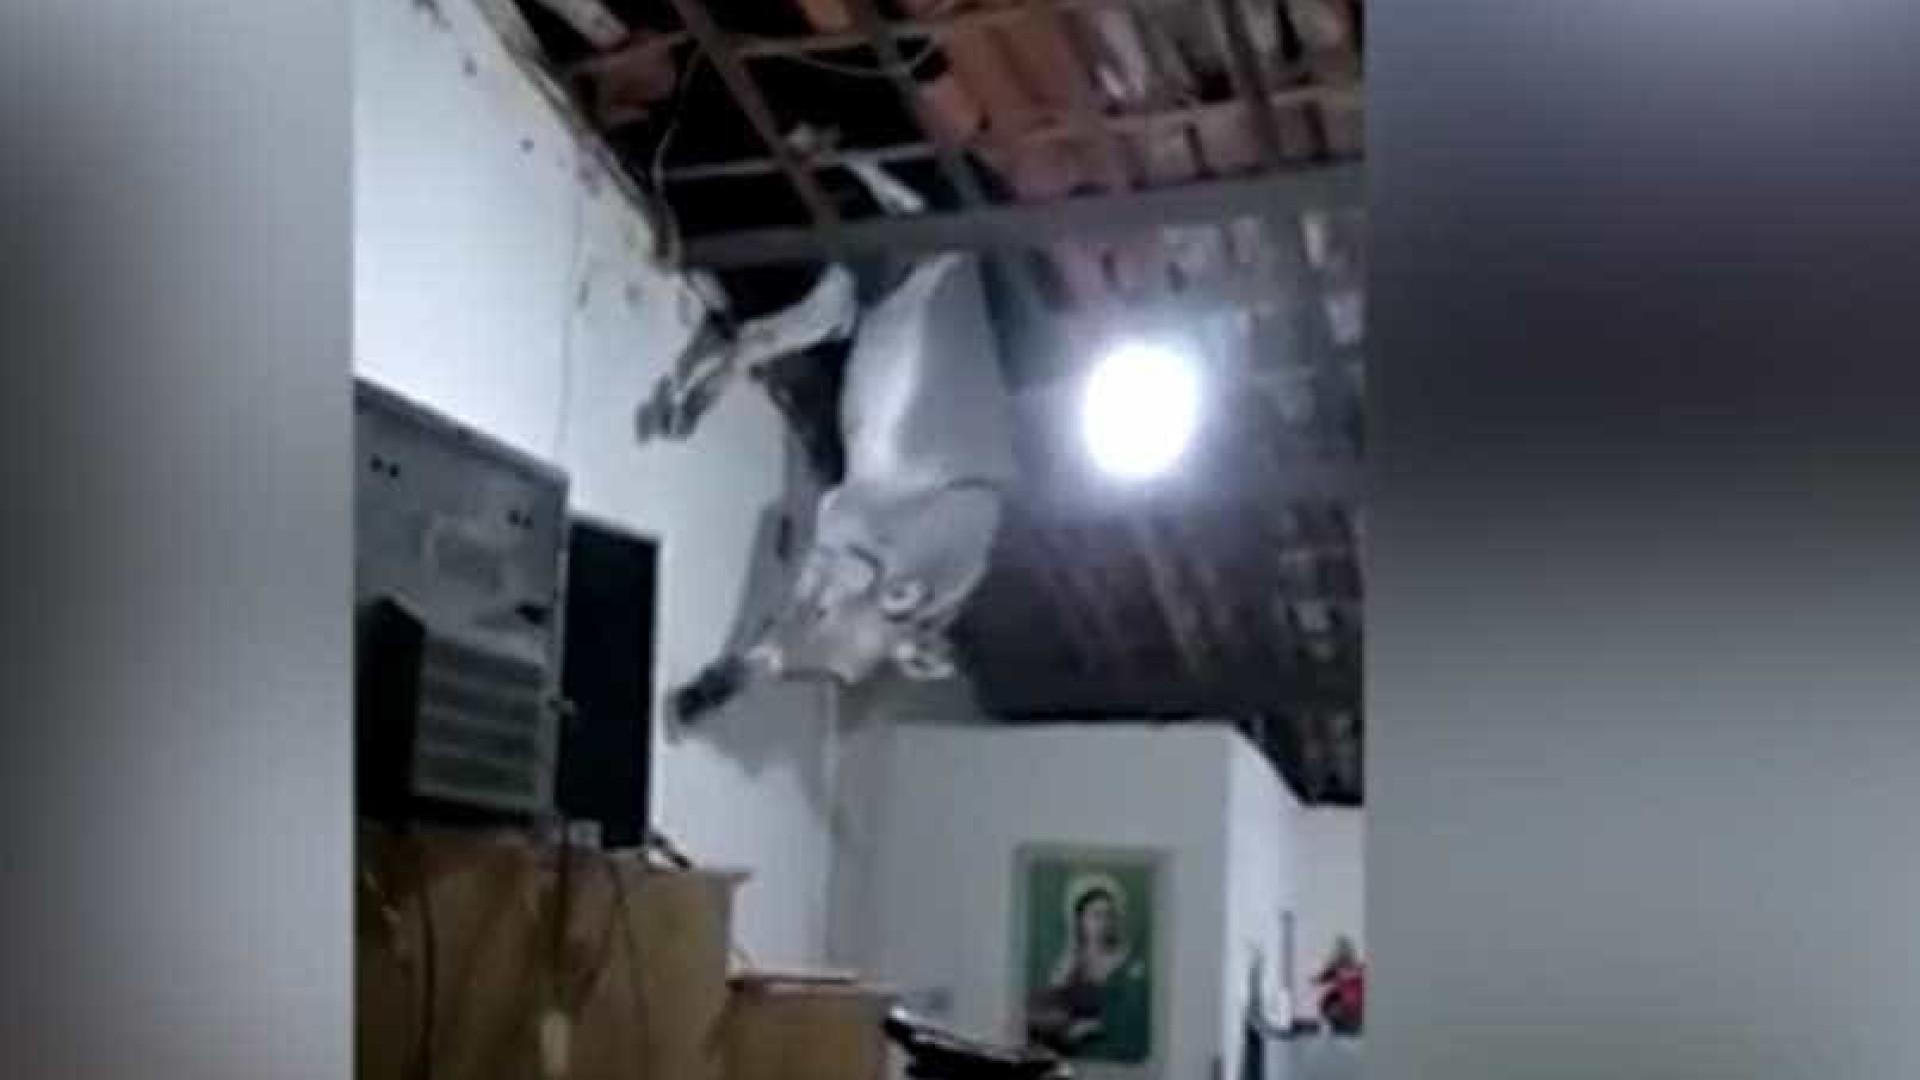 Jumento despenca de telhado de casa na Paraíba; veja vídeo